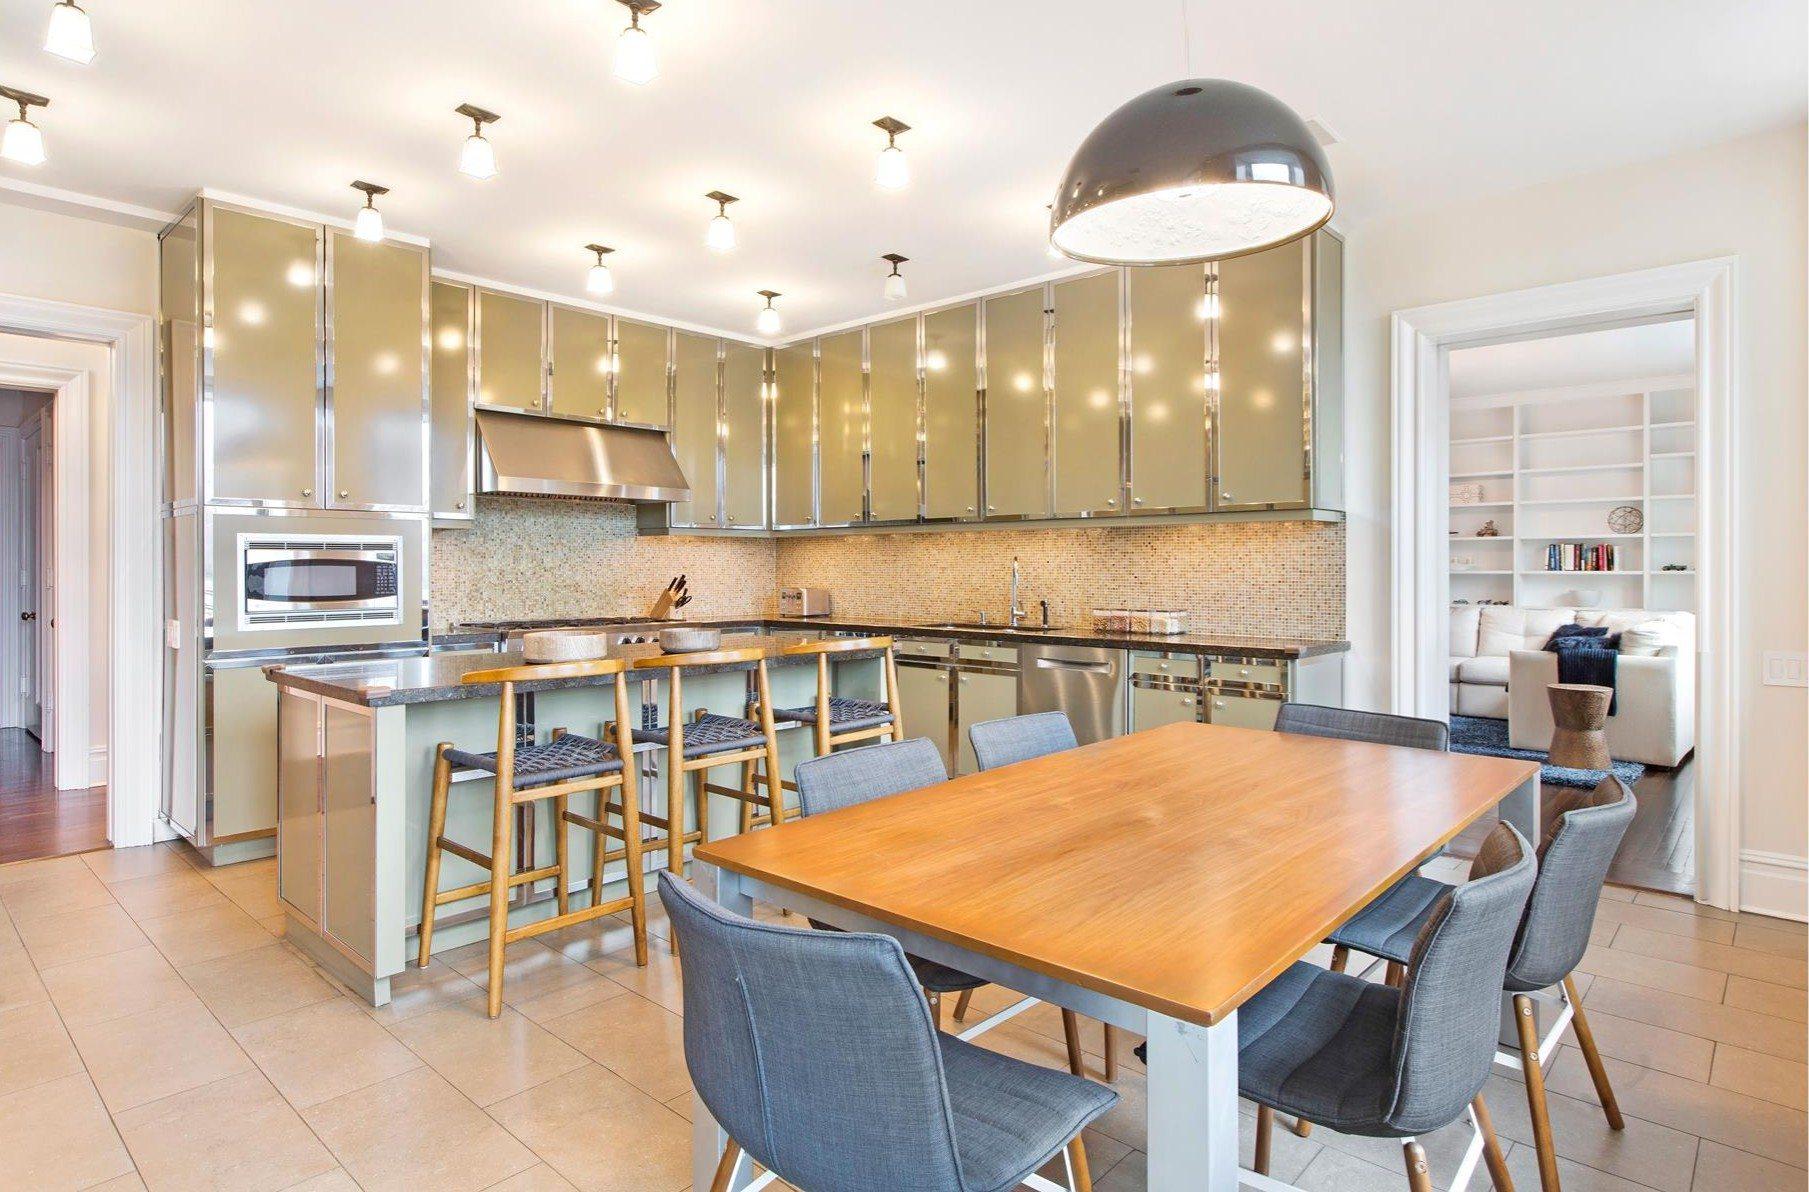 Una cocina totalmente equipada